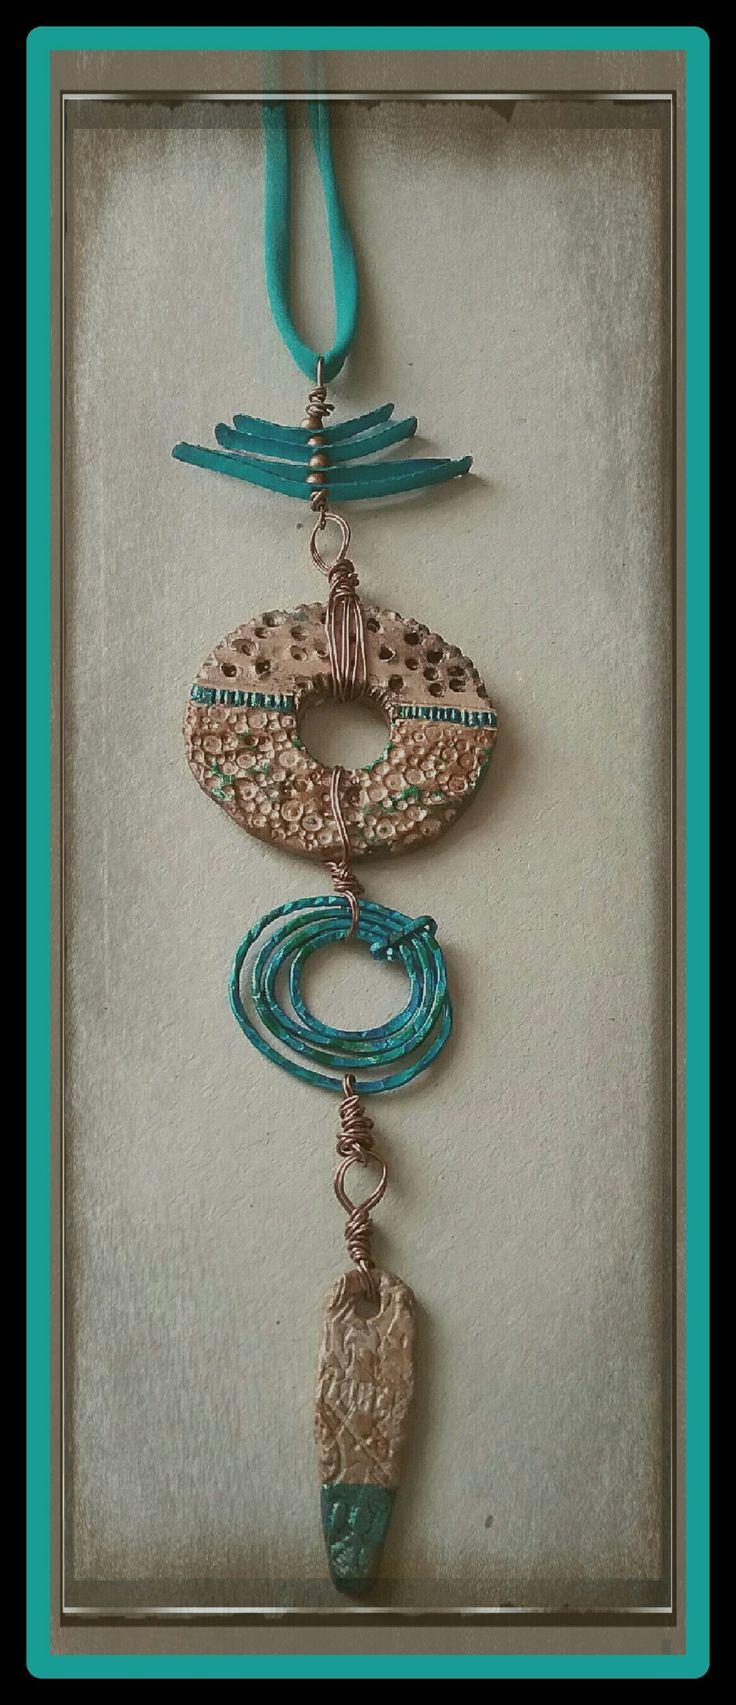 Handmade pendant necklace clay wire rustic primitive - aqua and sand - unique and original